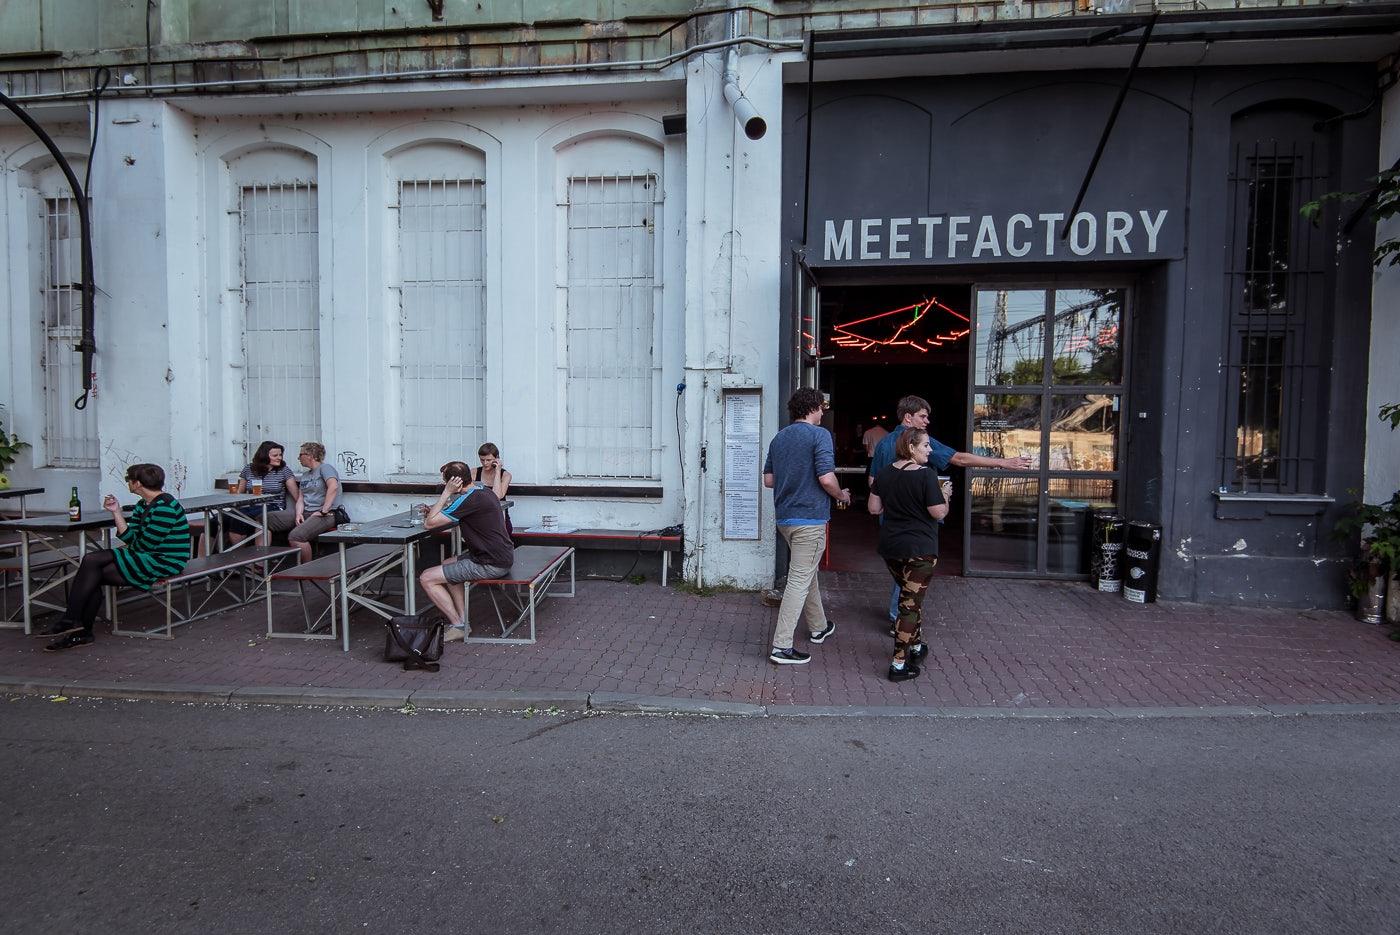 tables outside Meet Factory